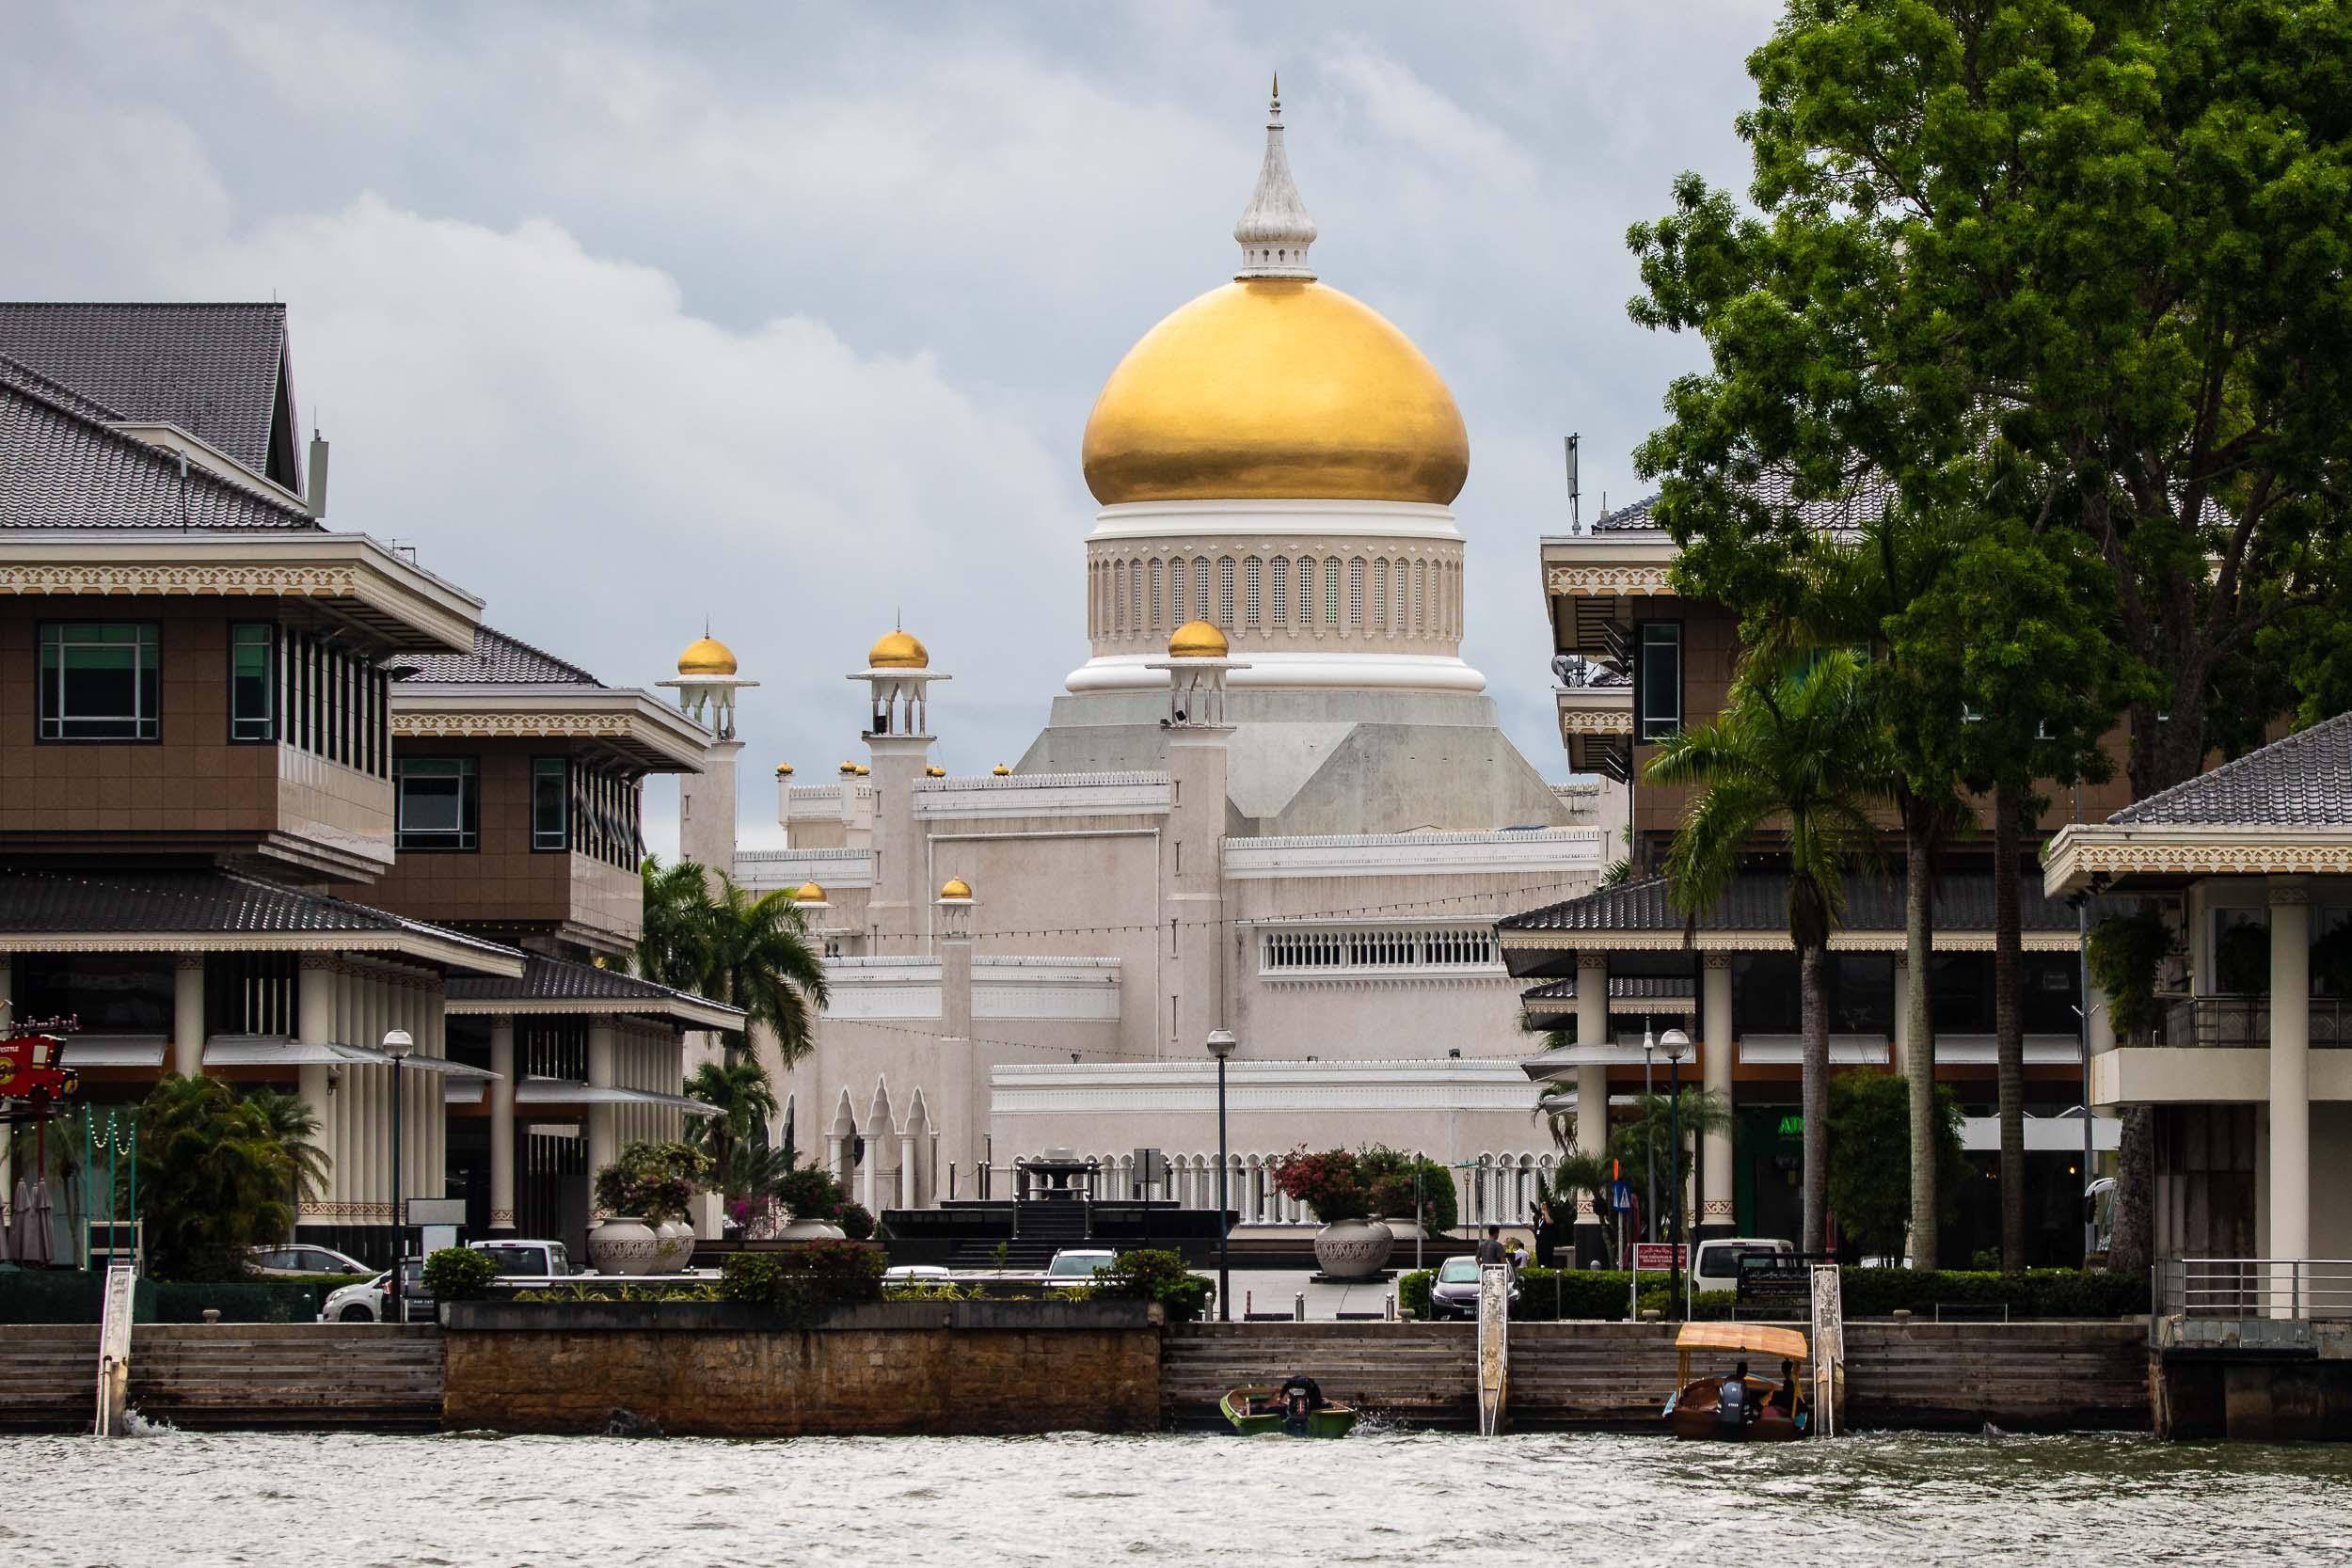 Sultan Omar Ali Saifuddien Mosque from Kunyit 7 Lodge,